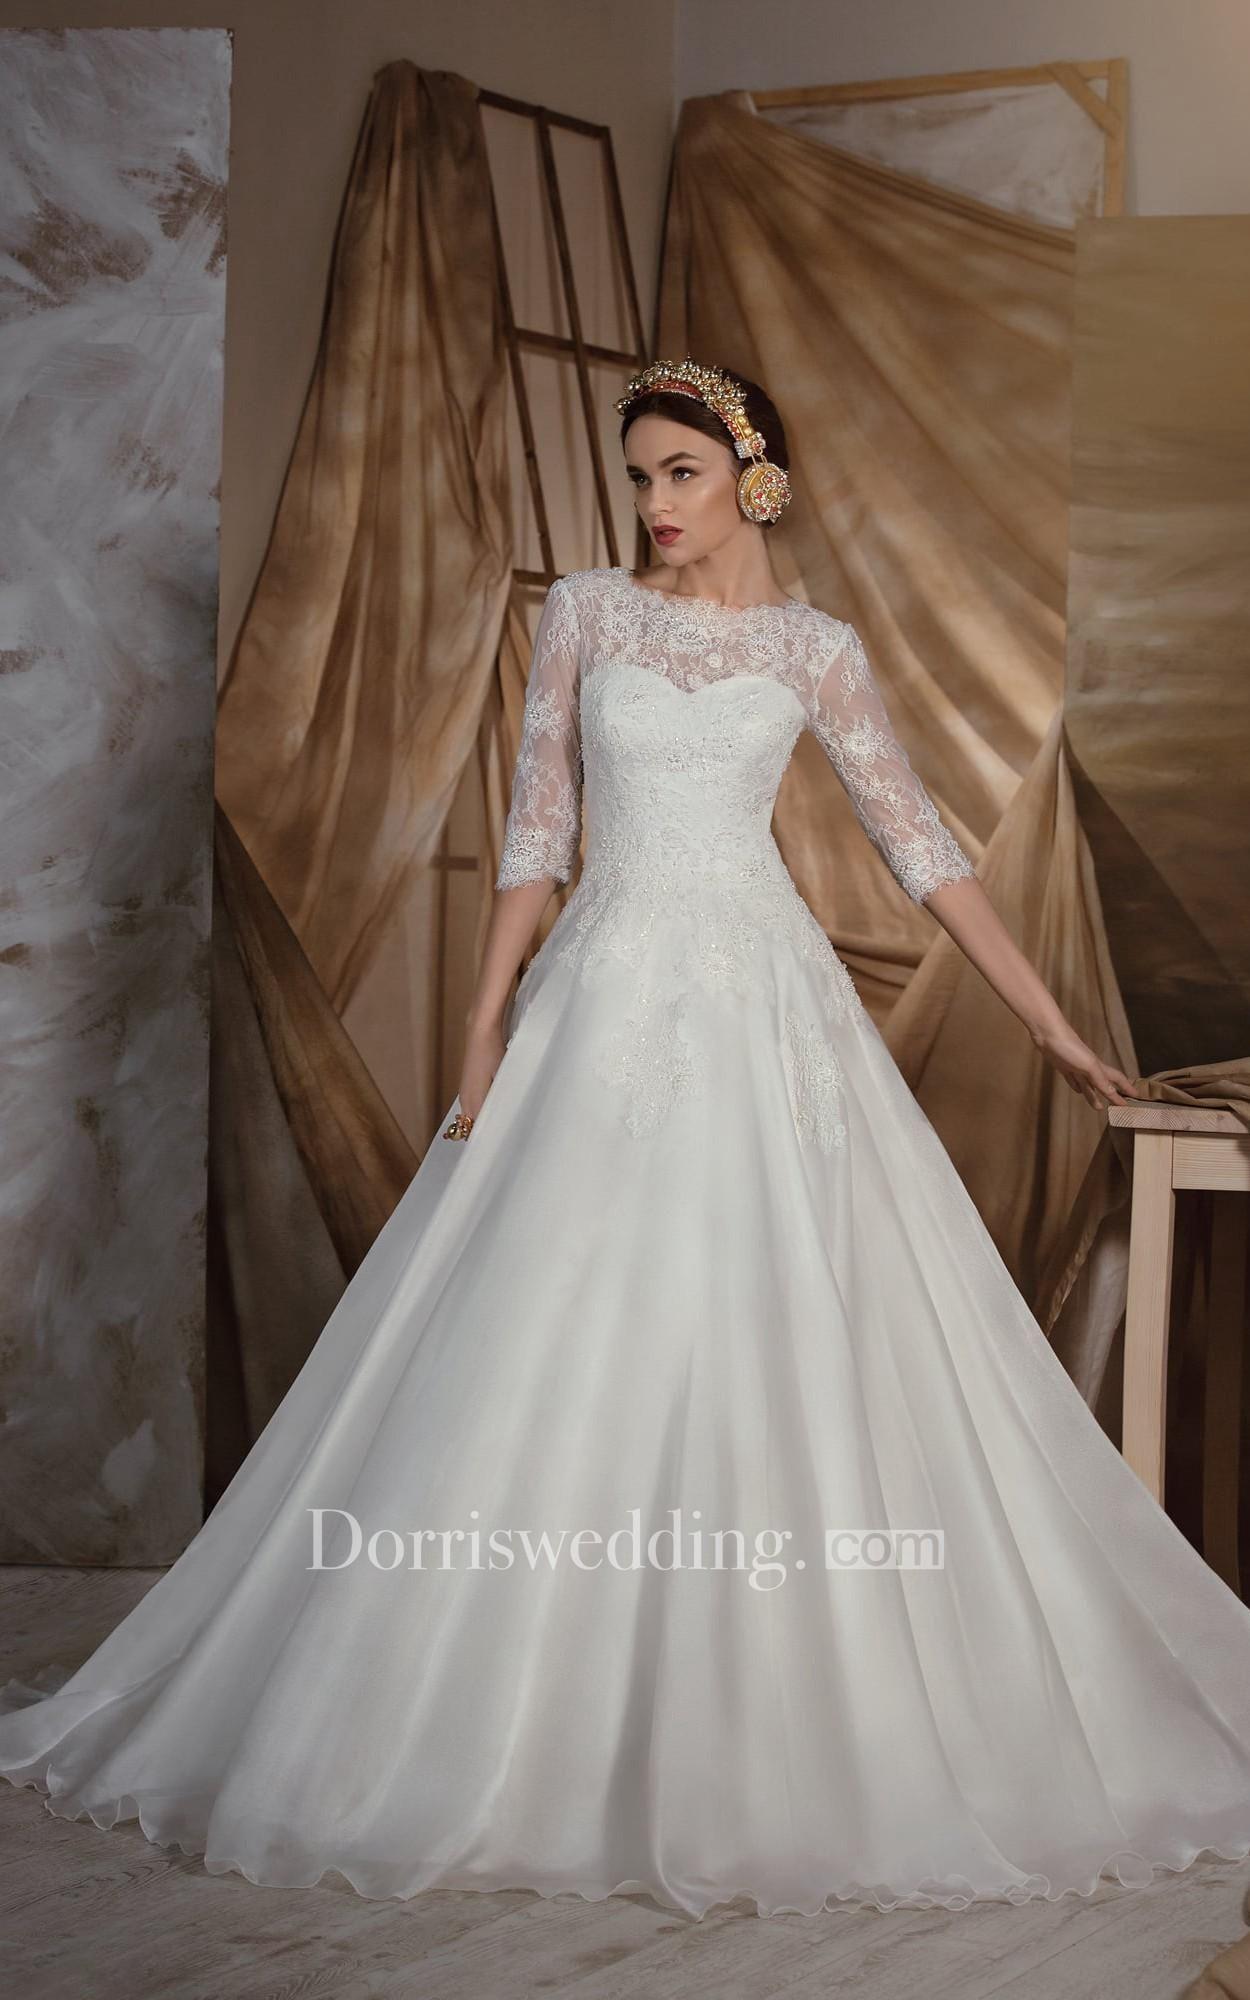 Dorris wedding dorris wedding aline floorlength bateau half